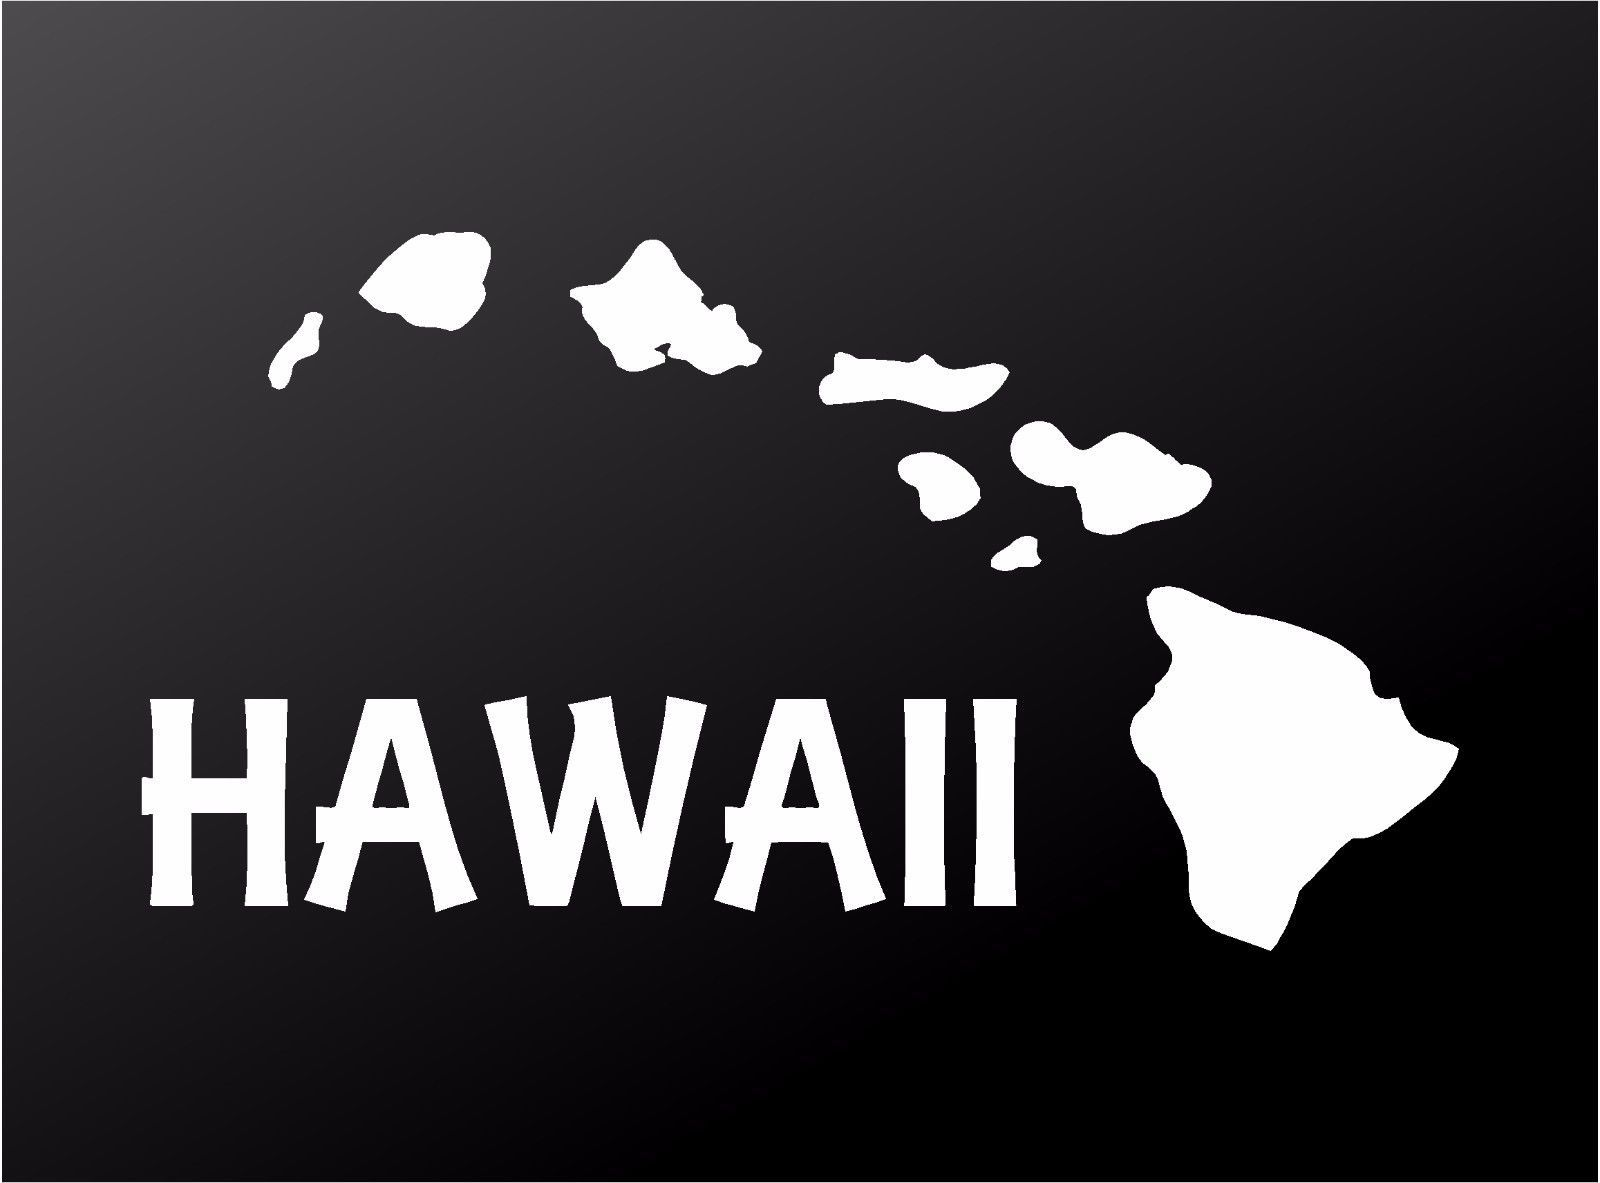 Hawaiian Islands Vinyl Decal Hawaii Aloha Car Window Laptop Surf Sticker Ebay Surf Stickers Surfboard Stickers Hawaii [ 1183 x 1600 Pixel ]